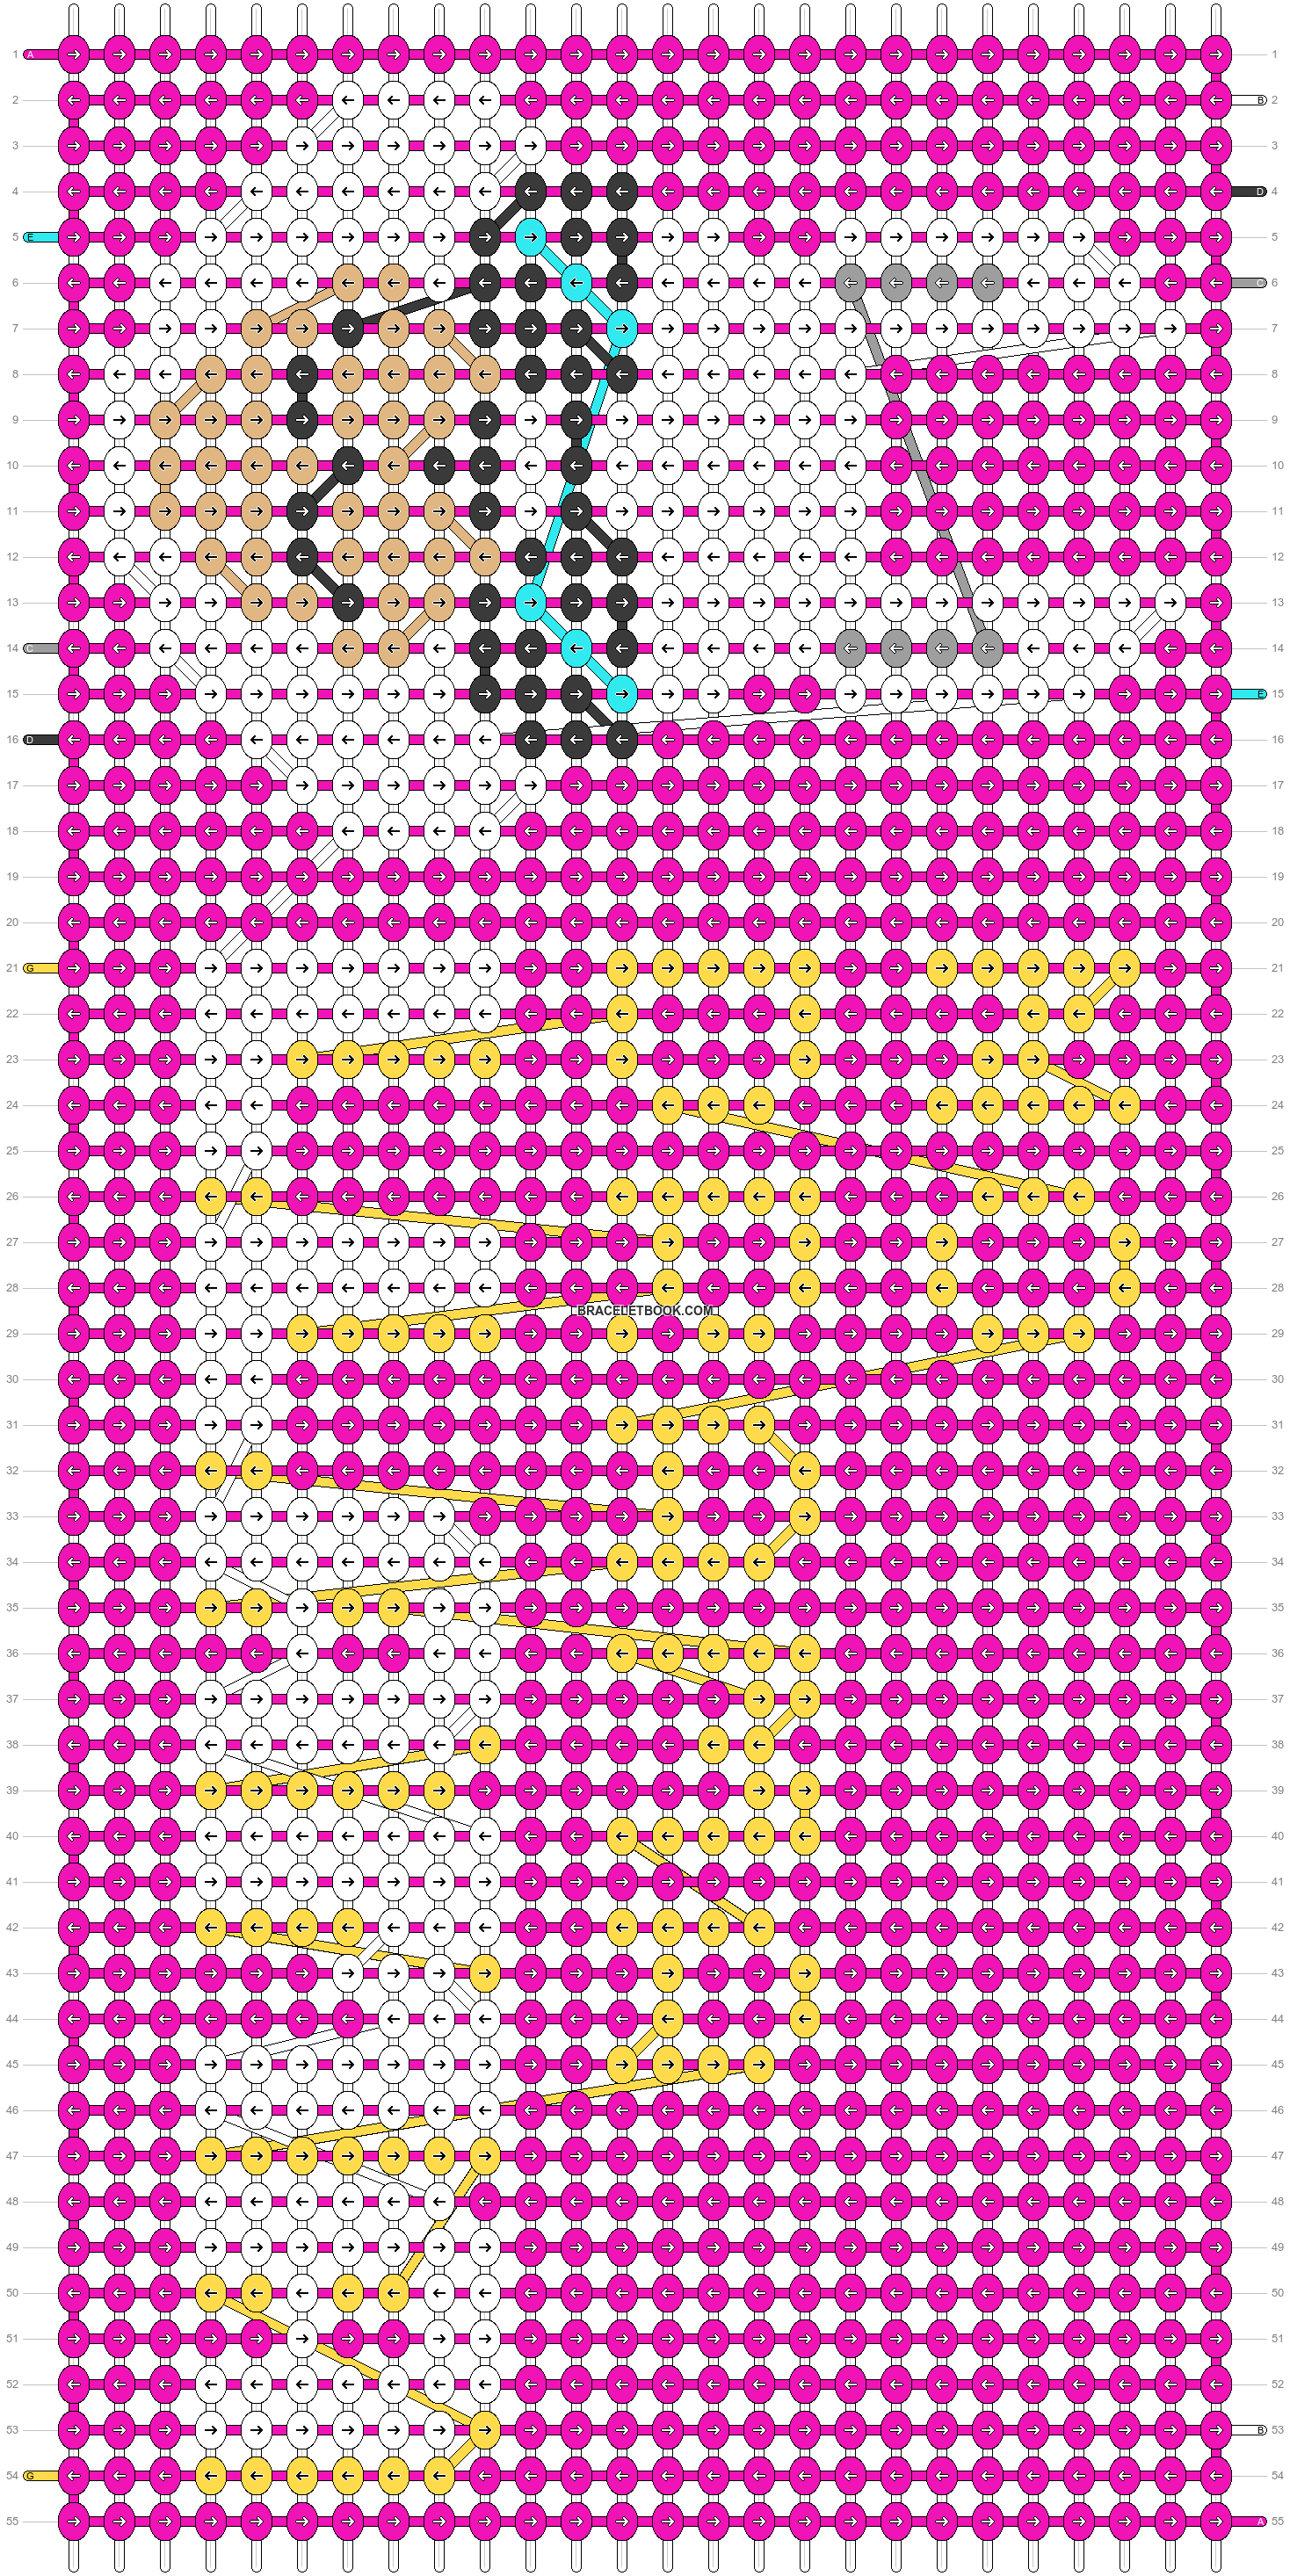 Alpha pattern #62534 pattern